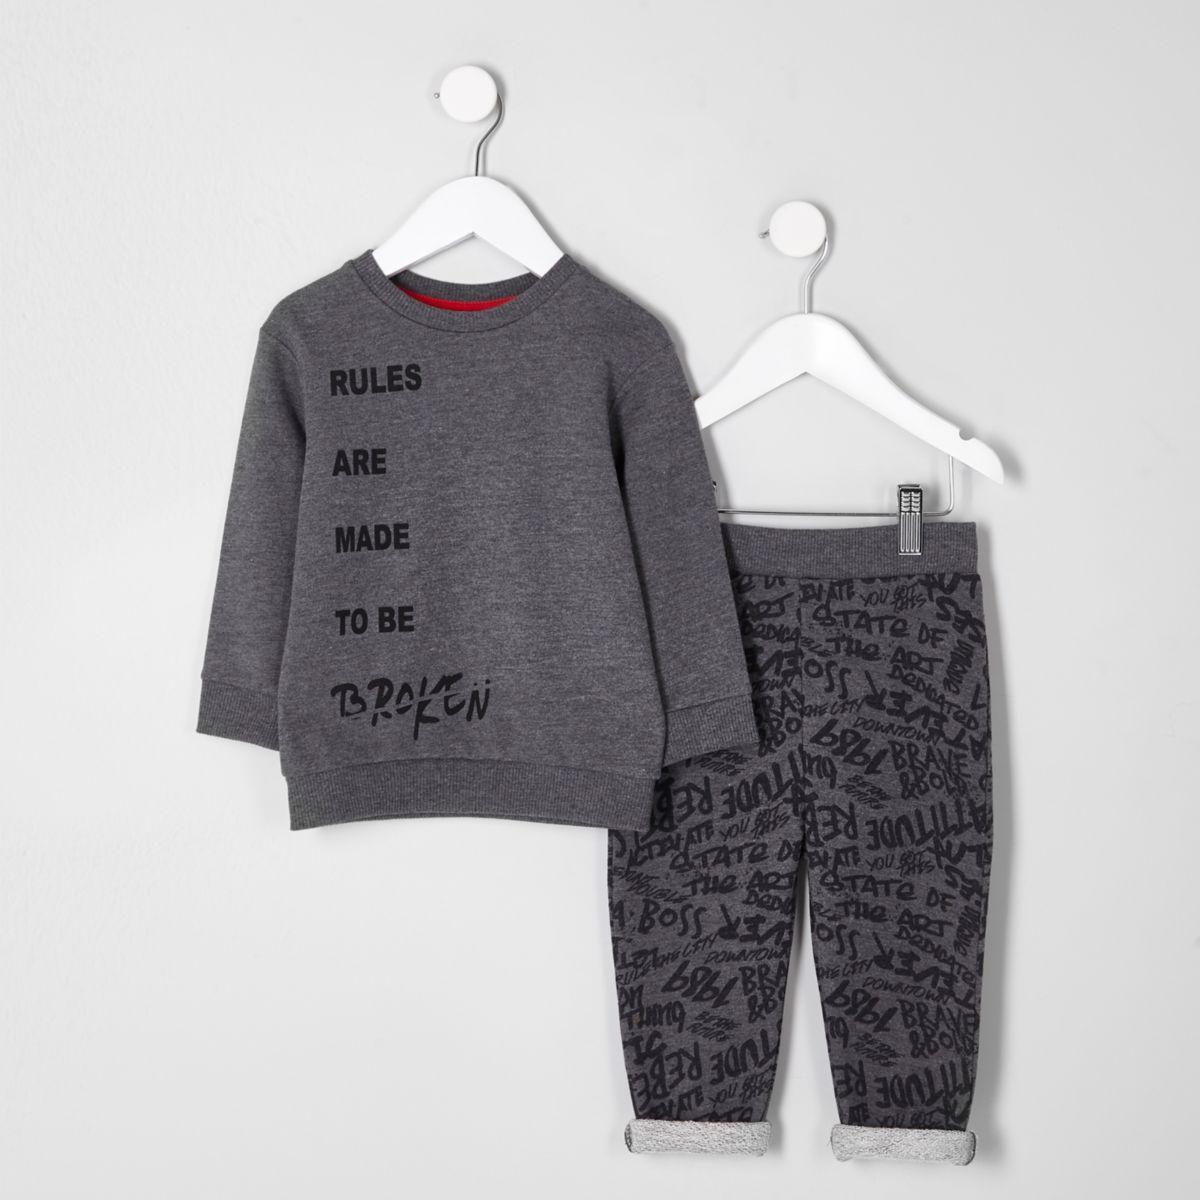 Mini boys grey 'rules' sweatshirt outfit